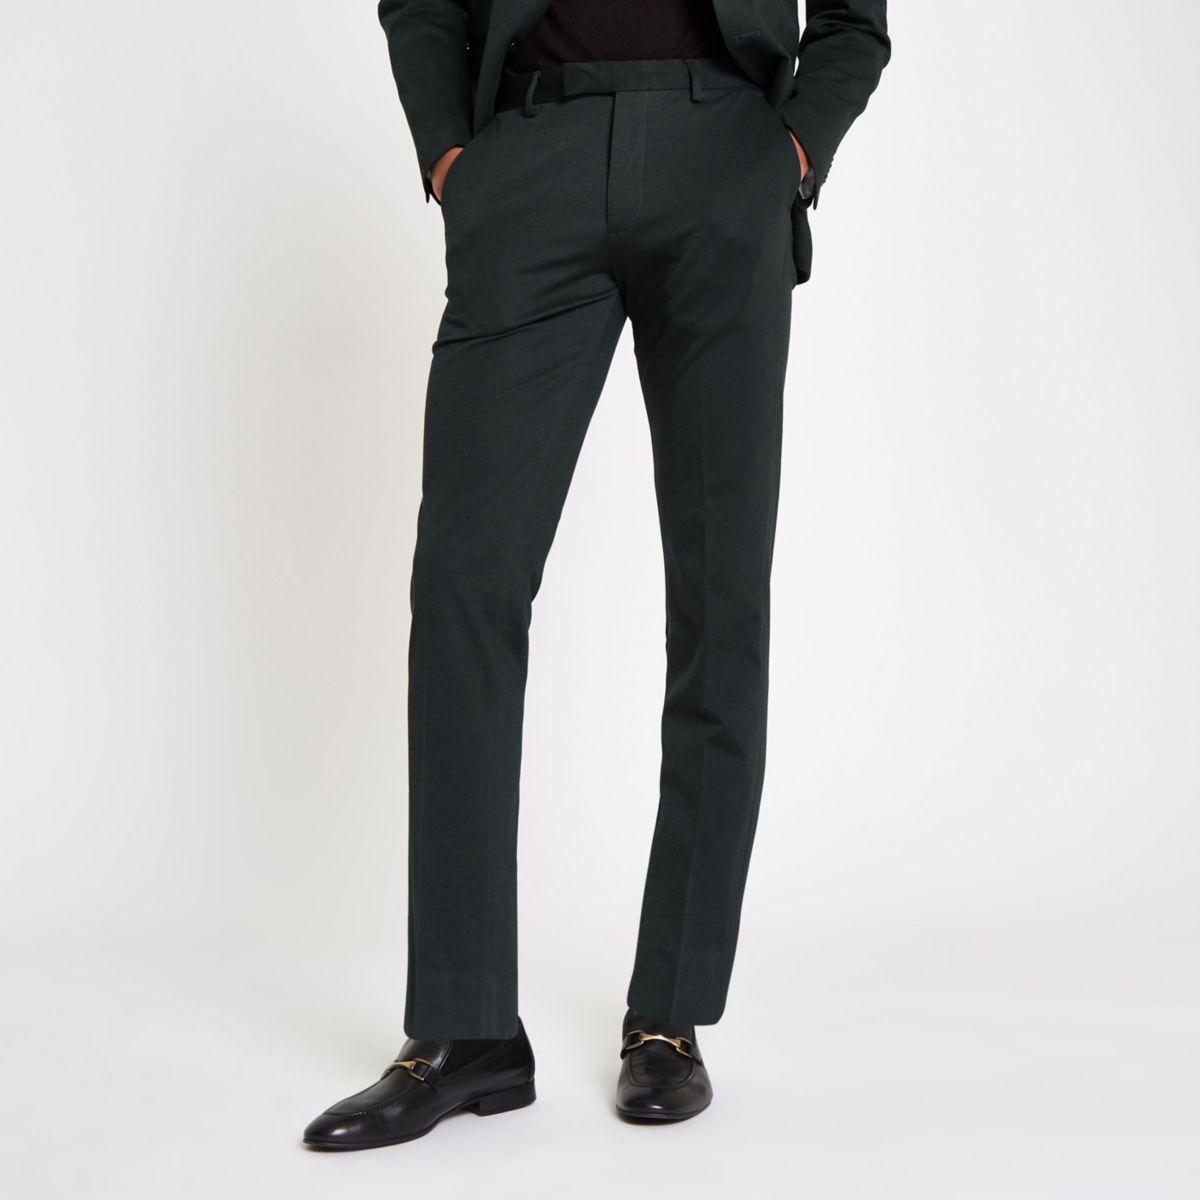 Jack & Jones Premium green suit trousers